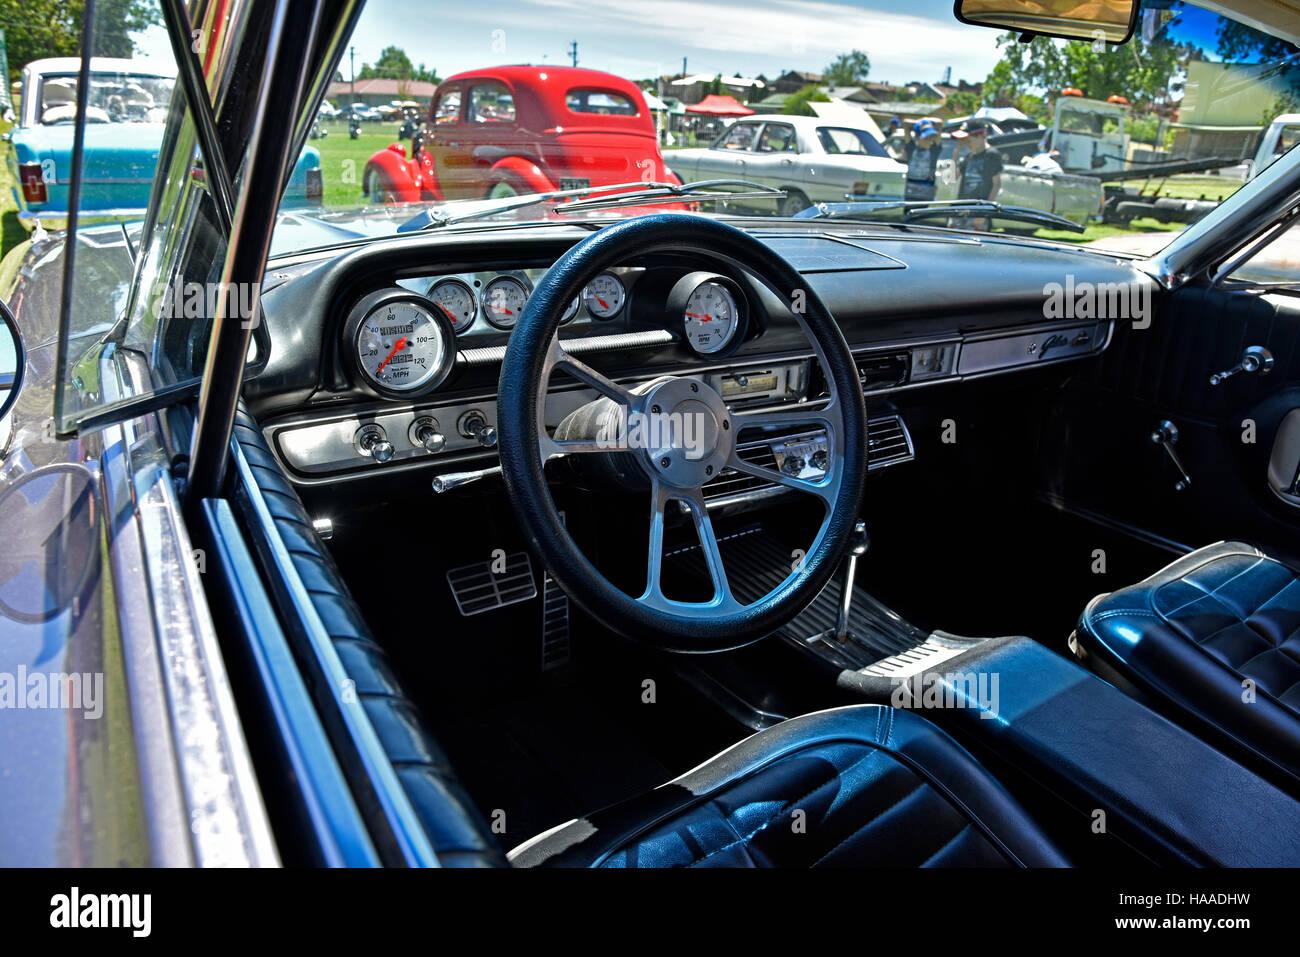 http://c8.alamy.com/compde/haadhw/klassische-1964-ford-galaxie-500-xl-auto-show-in-glen-innes-in-neu-sud-wales-australien-zeigt-interieur-haadhw.jpg